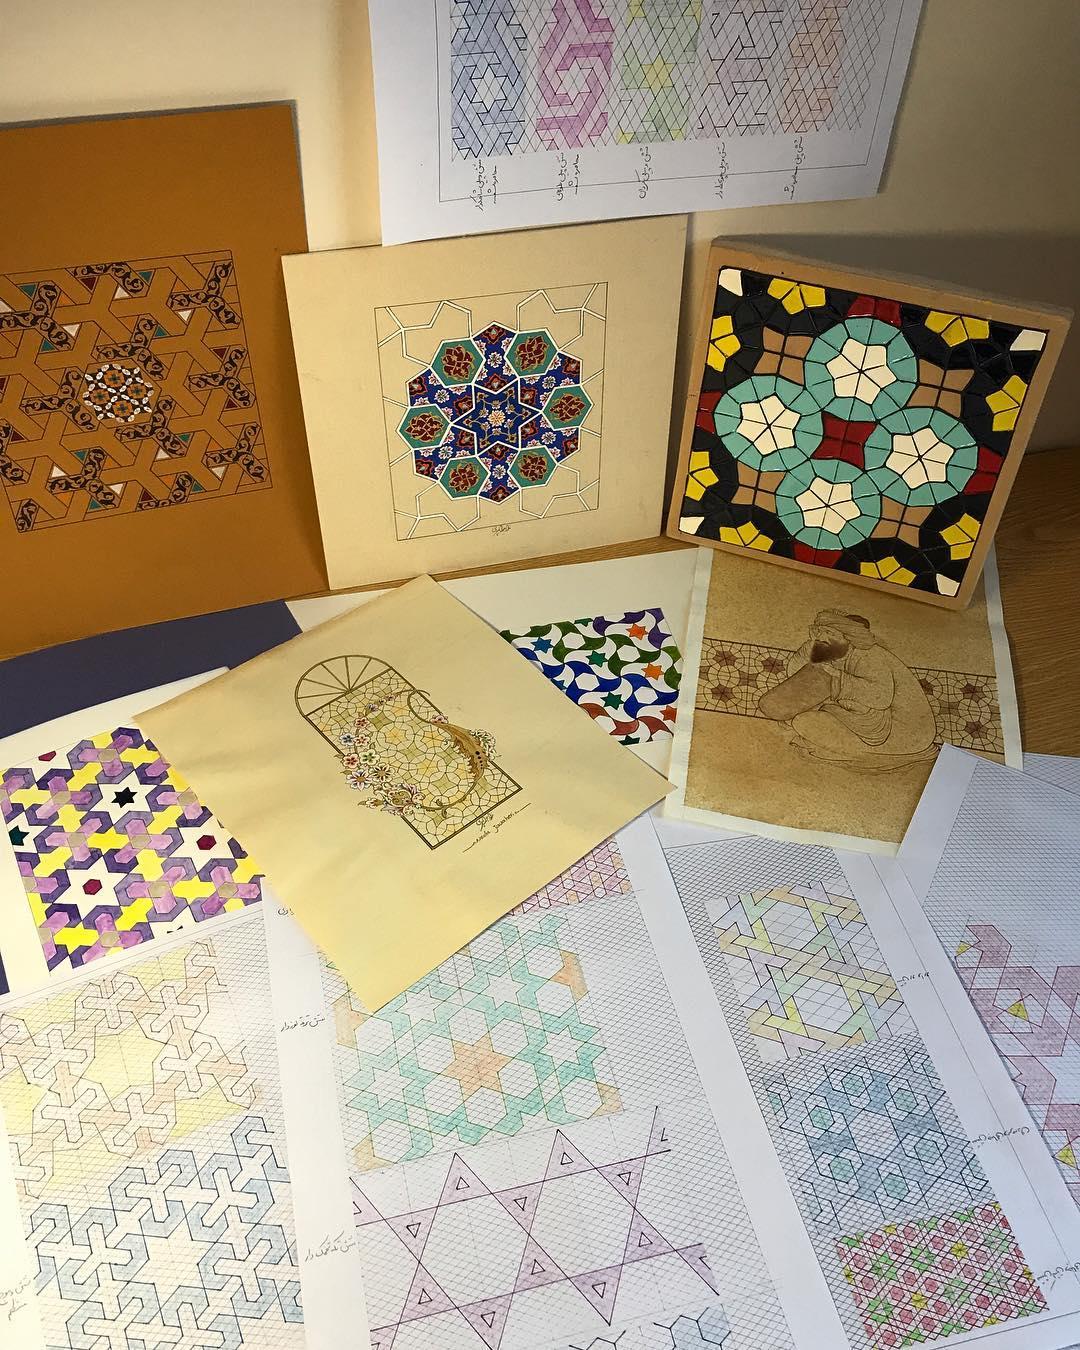 Karya Kaligrafi Six point star patterns پست اول:گره های شش پ.ن . با توجه به شروع دوره های تابستا…- Ne Javaher